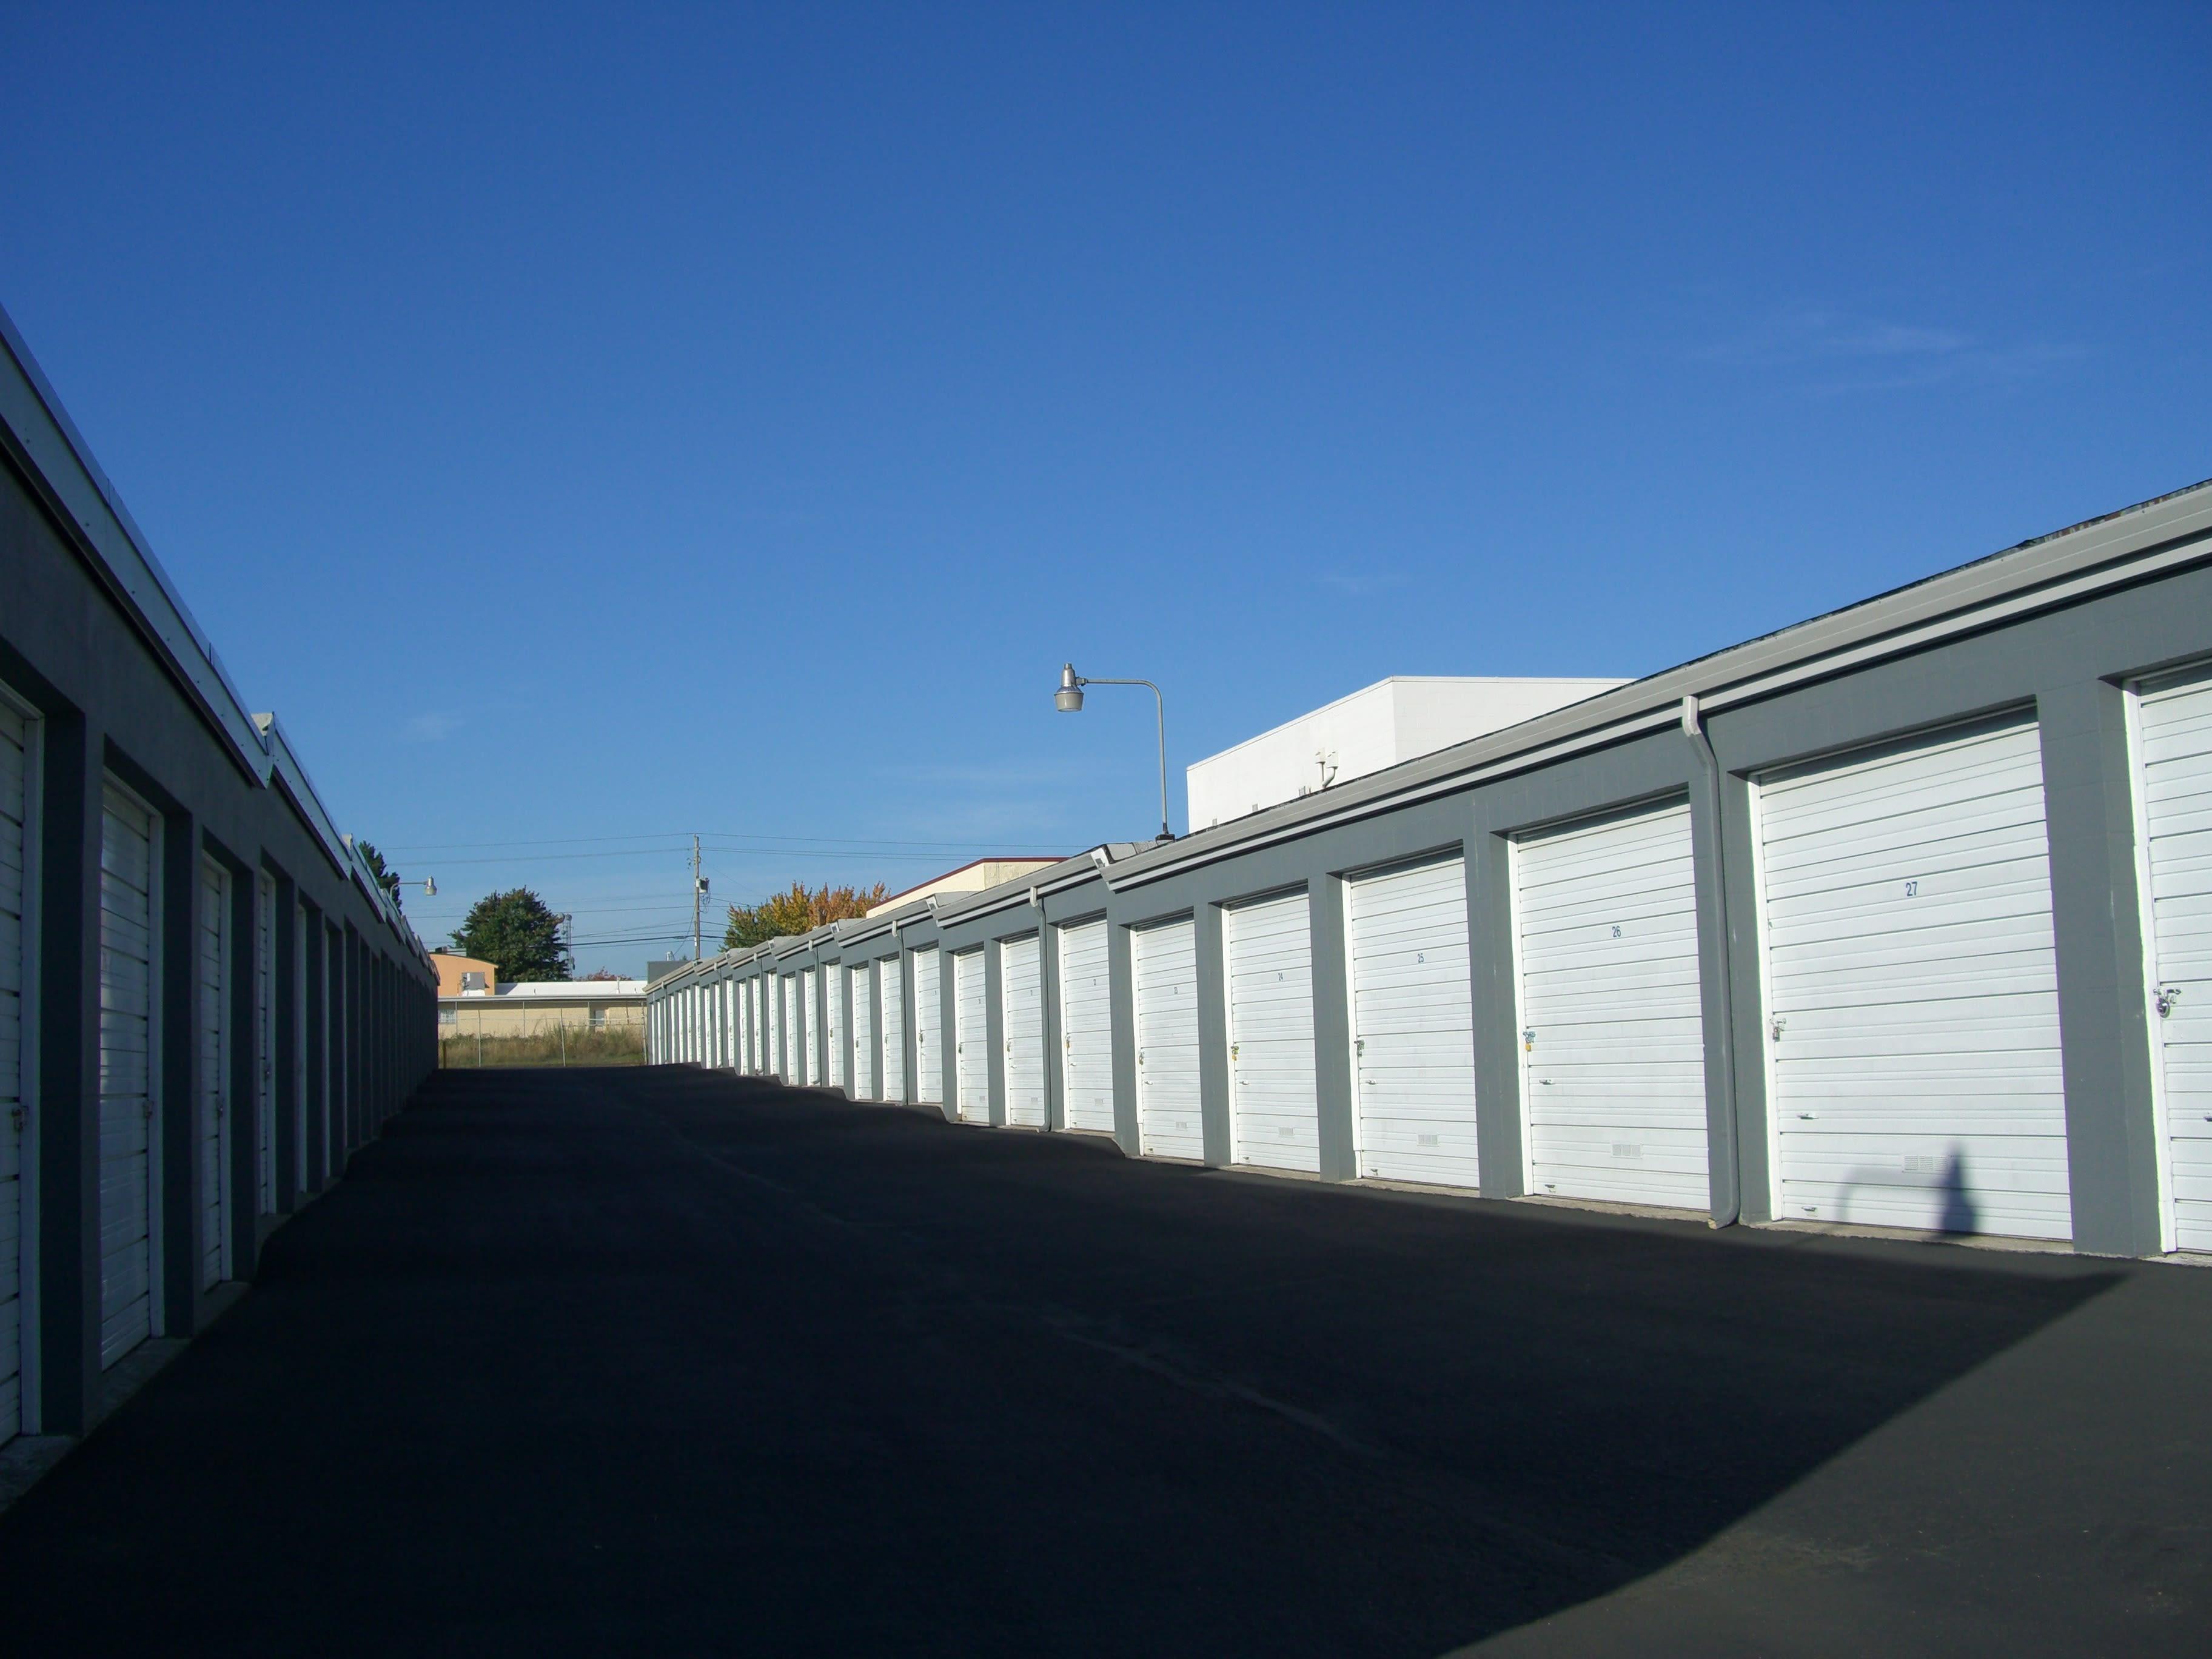 U-Lock-It Self Storage in Vancouver, Washington